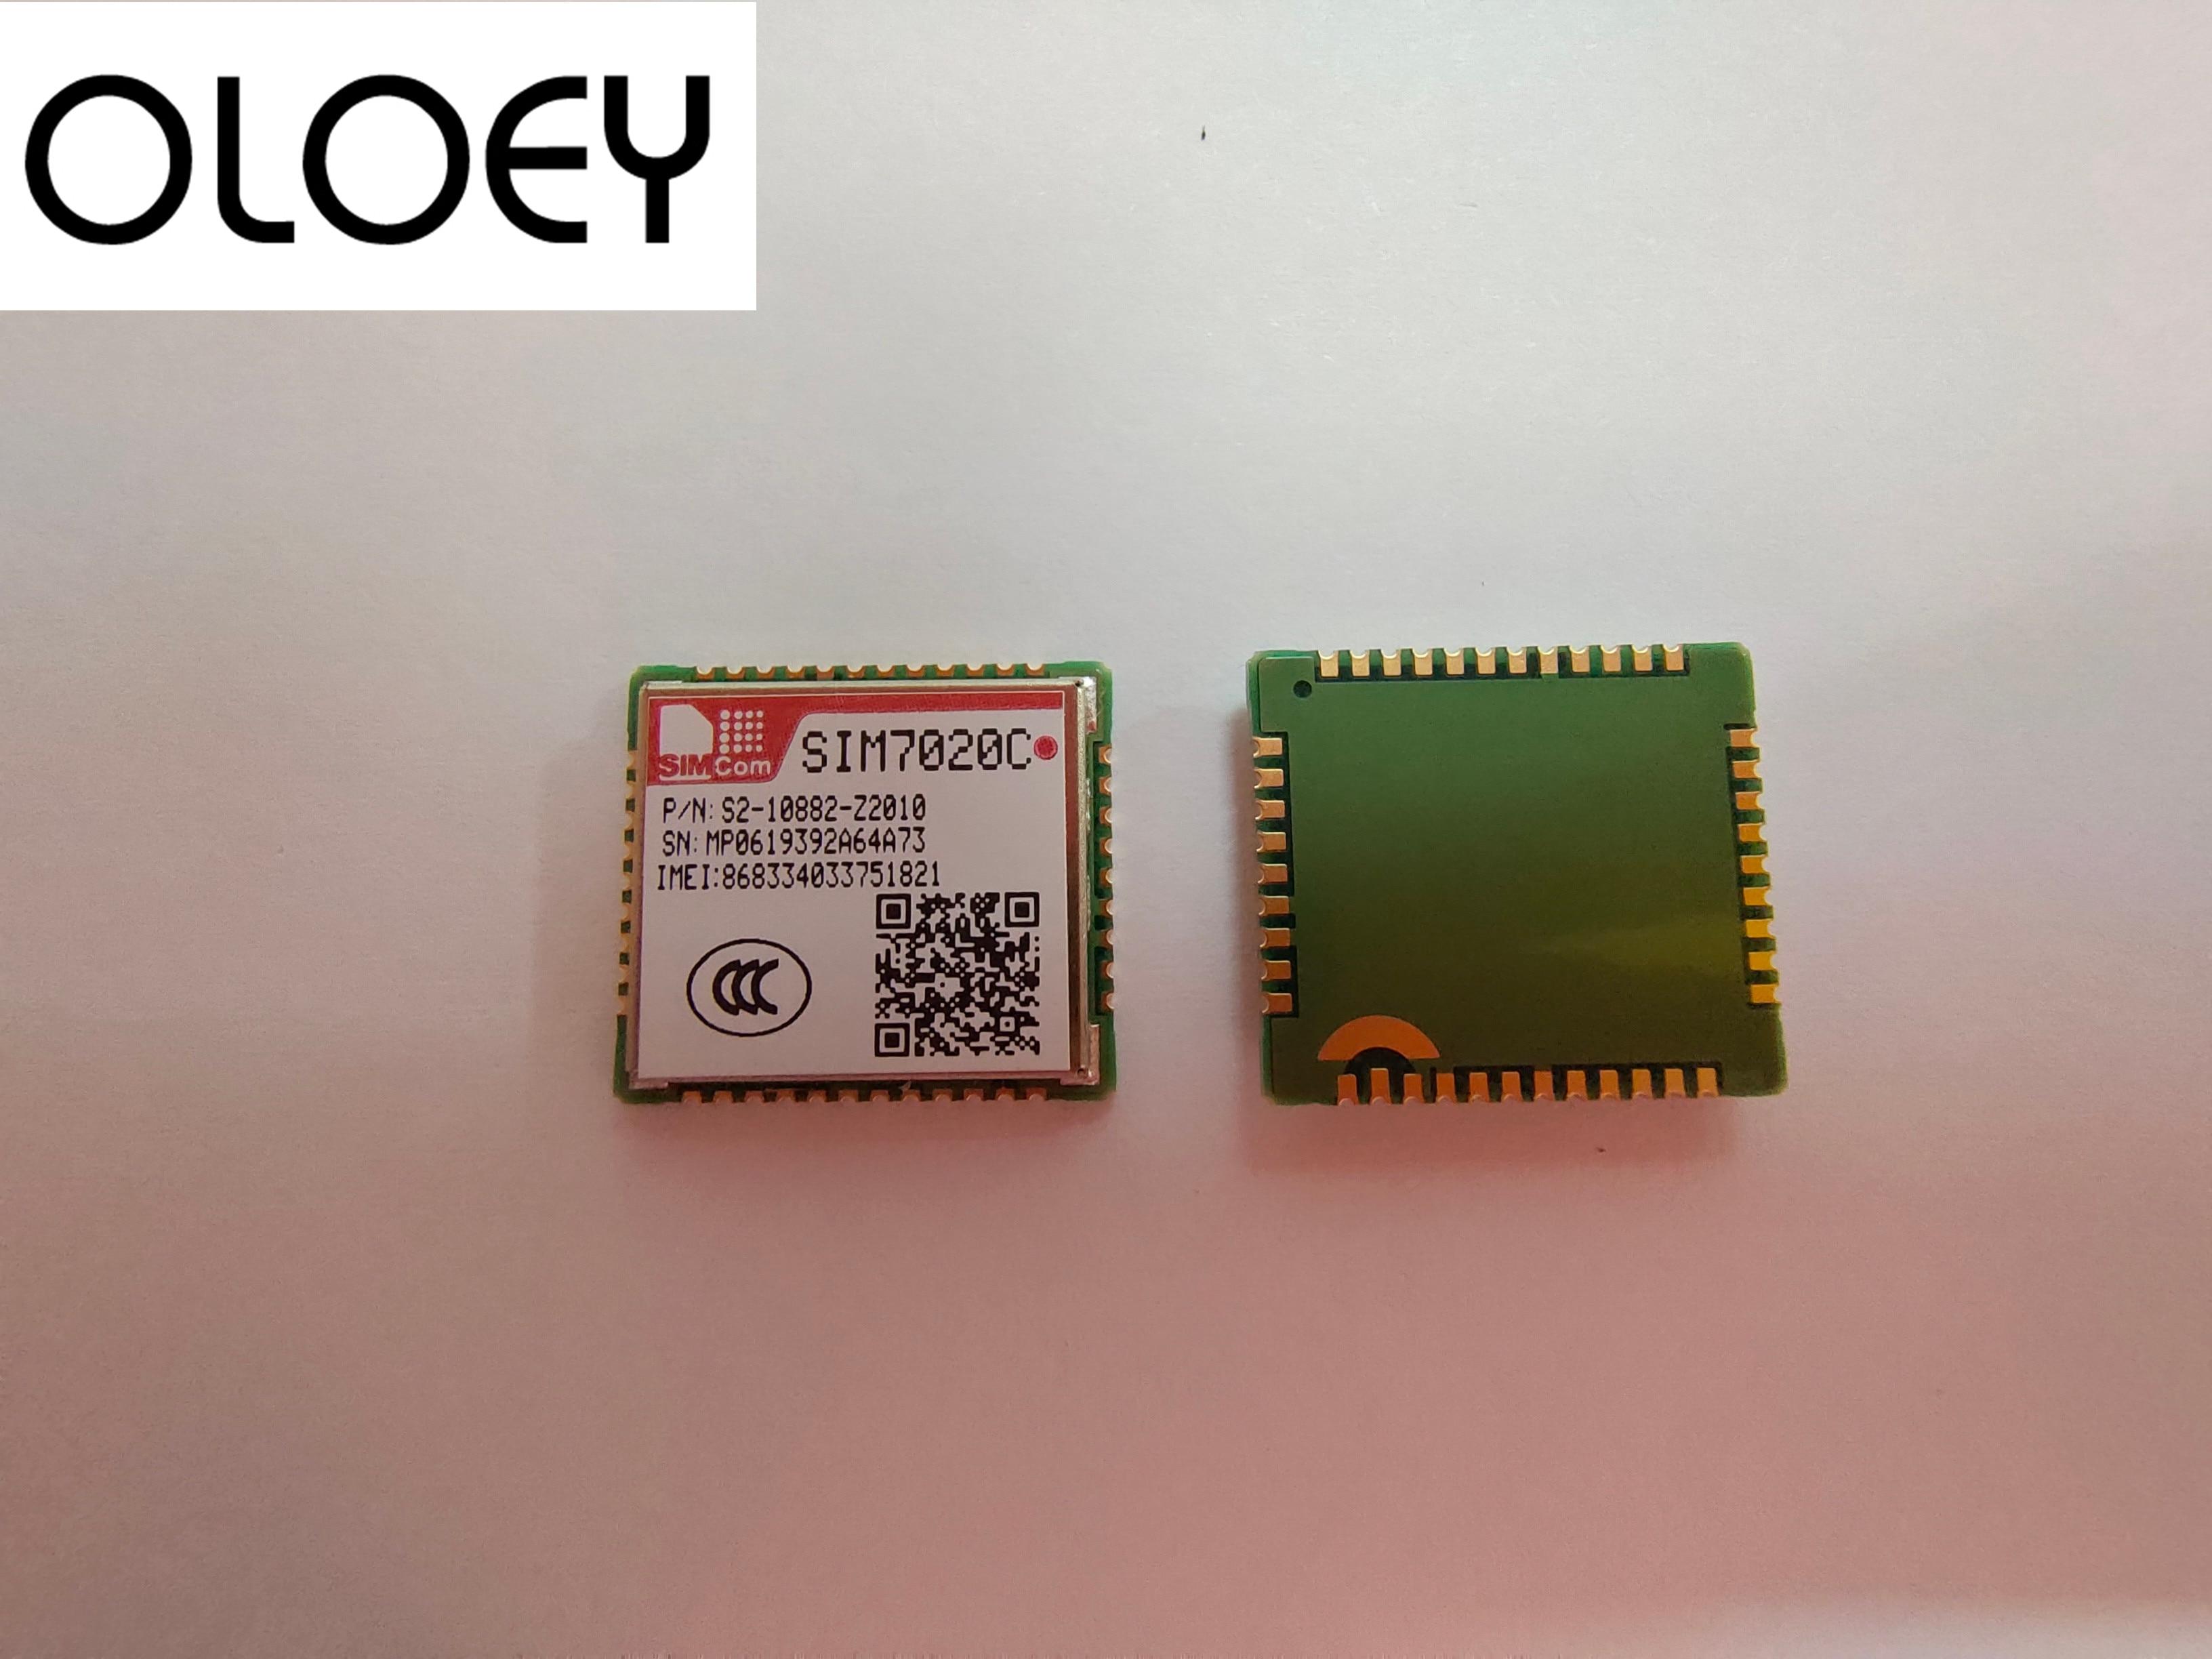 SIMCOM SIM7020C New&Original Multi-Band B1/B3/B5/B8 LTE NB-IoT SMT Type M2M Module Compatible With SIM800C